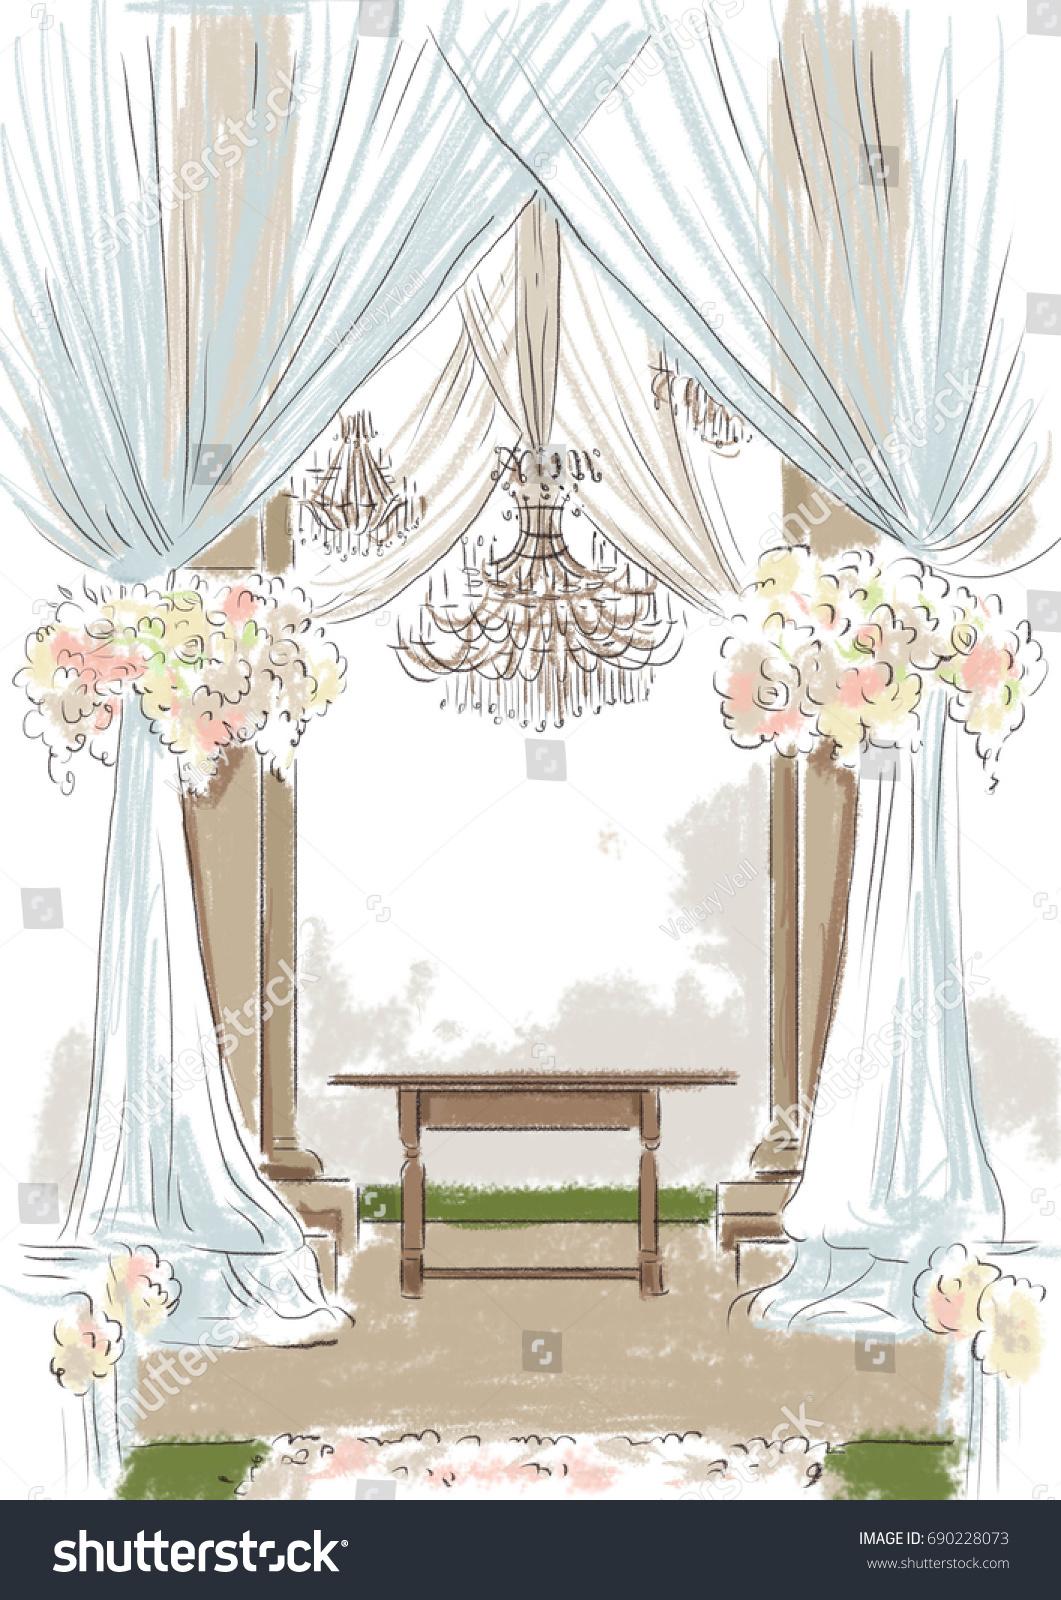 Wedding Decor Altar Sketch Beige Tones Stock Illustration 690228073